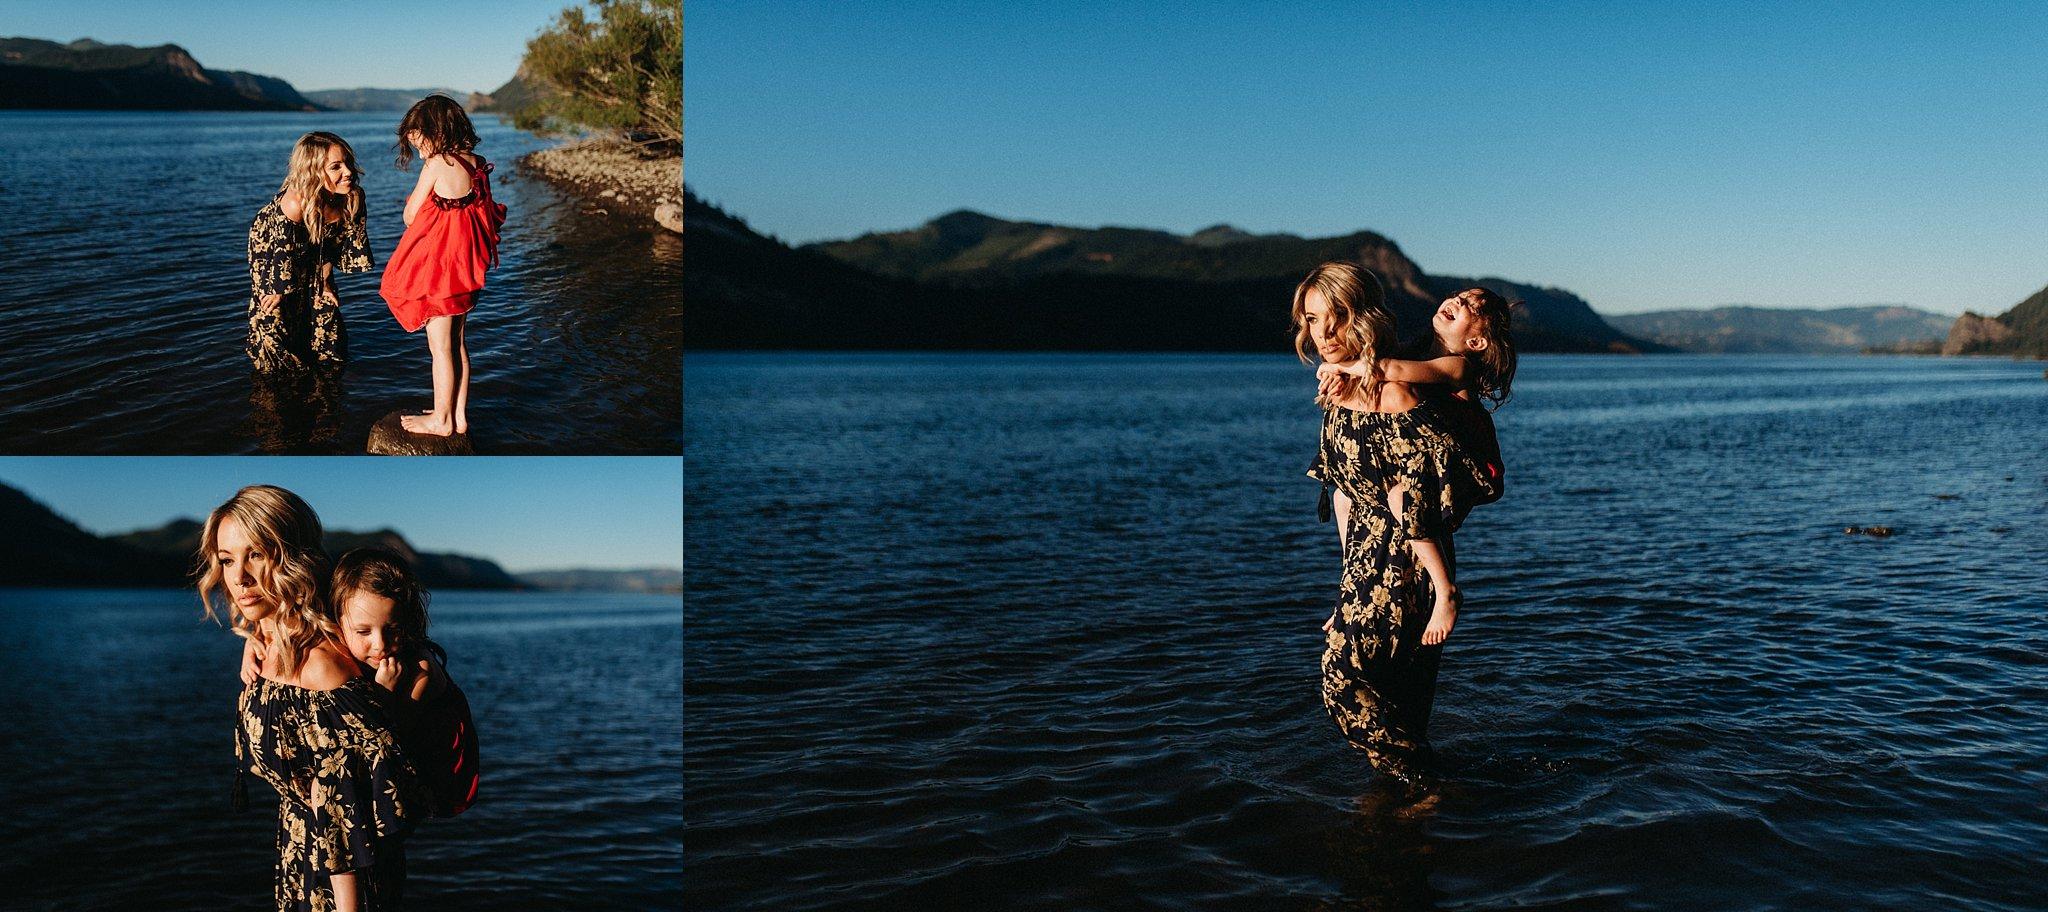 twyla jones photography - treasure coast florida - intimate couples session urban cowboy b&b | brooklyn New York_0077.jpg